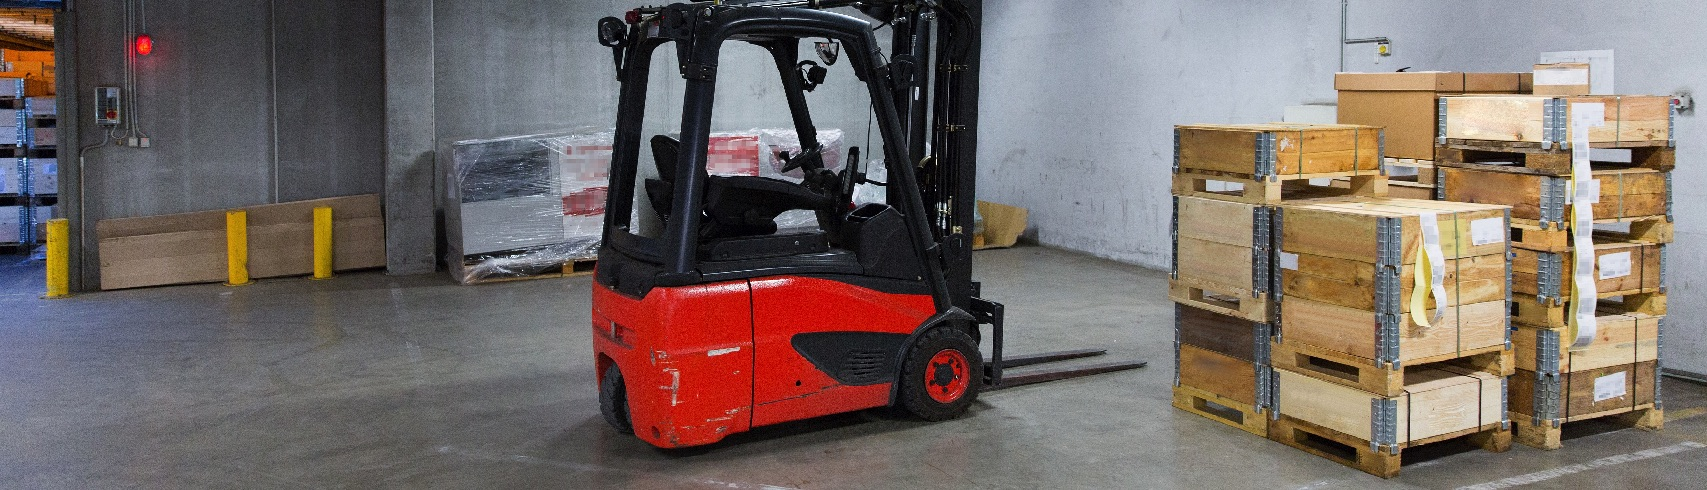 Forklift & Telehandler Rental | NYC